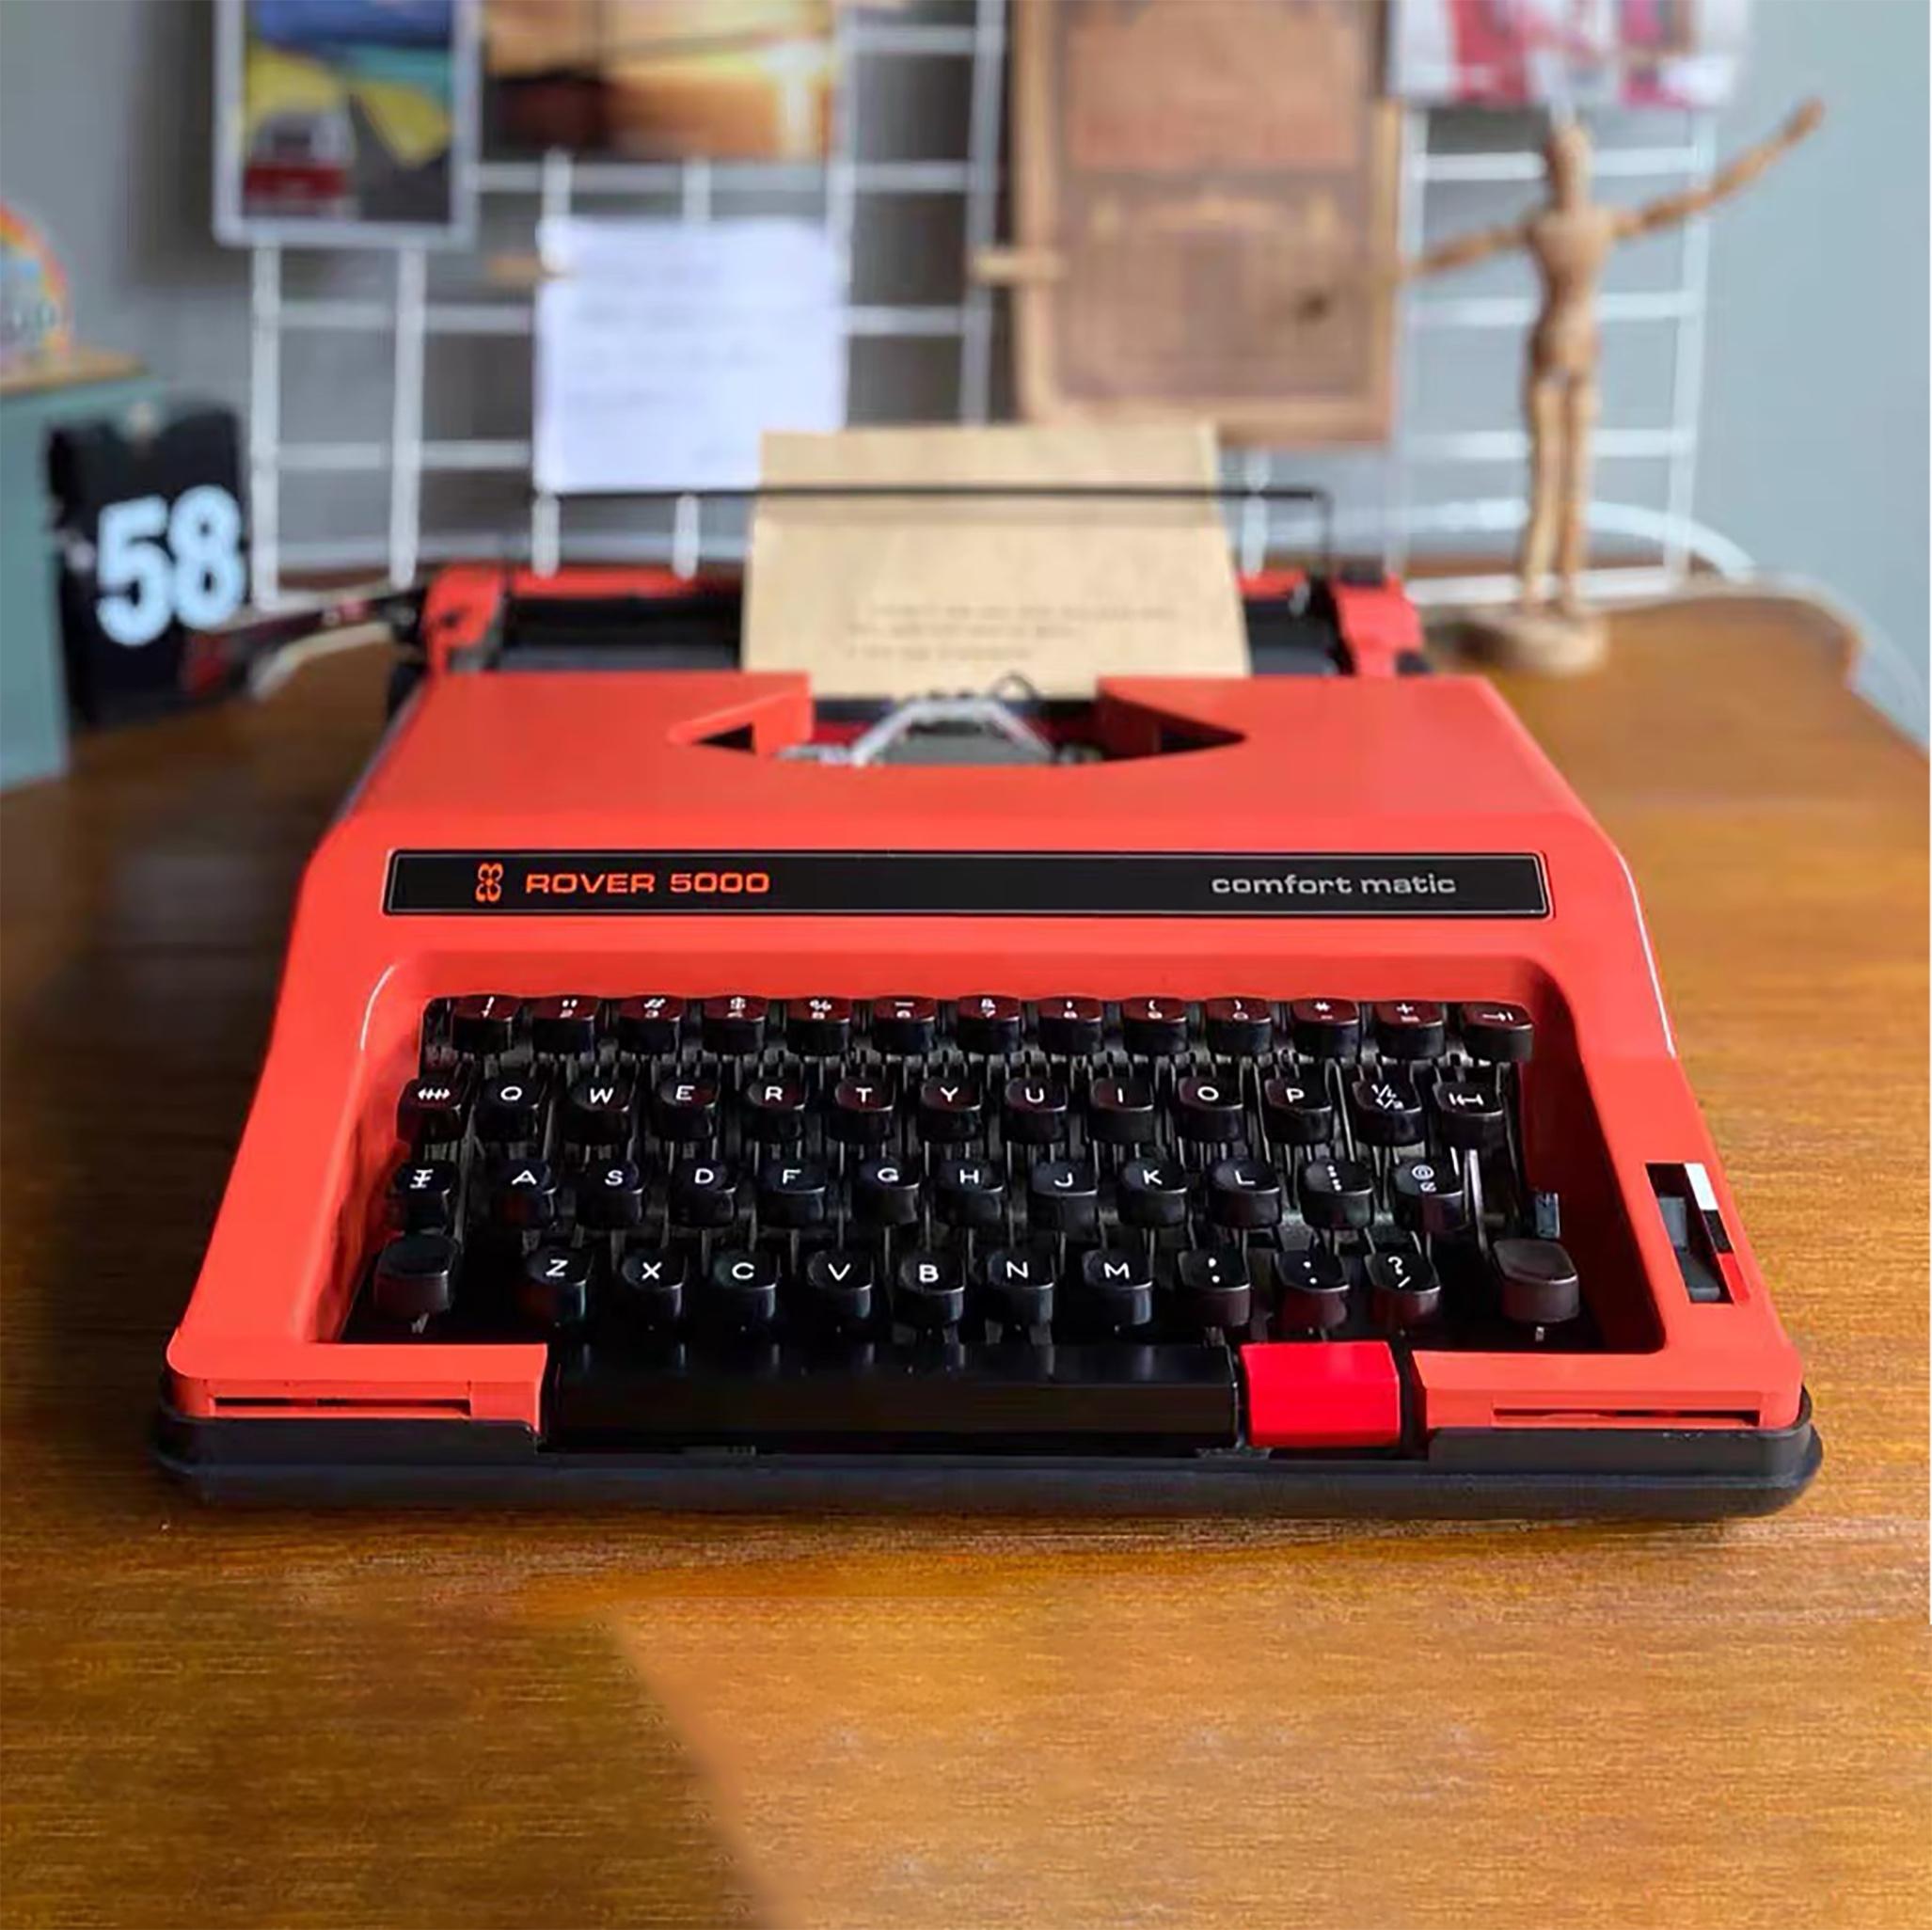 Пишущие машинки Артикул 600395874670